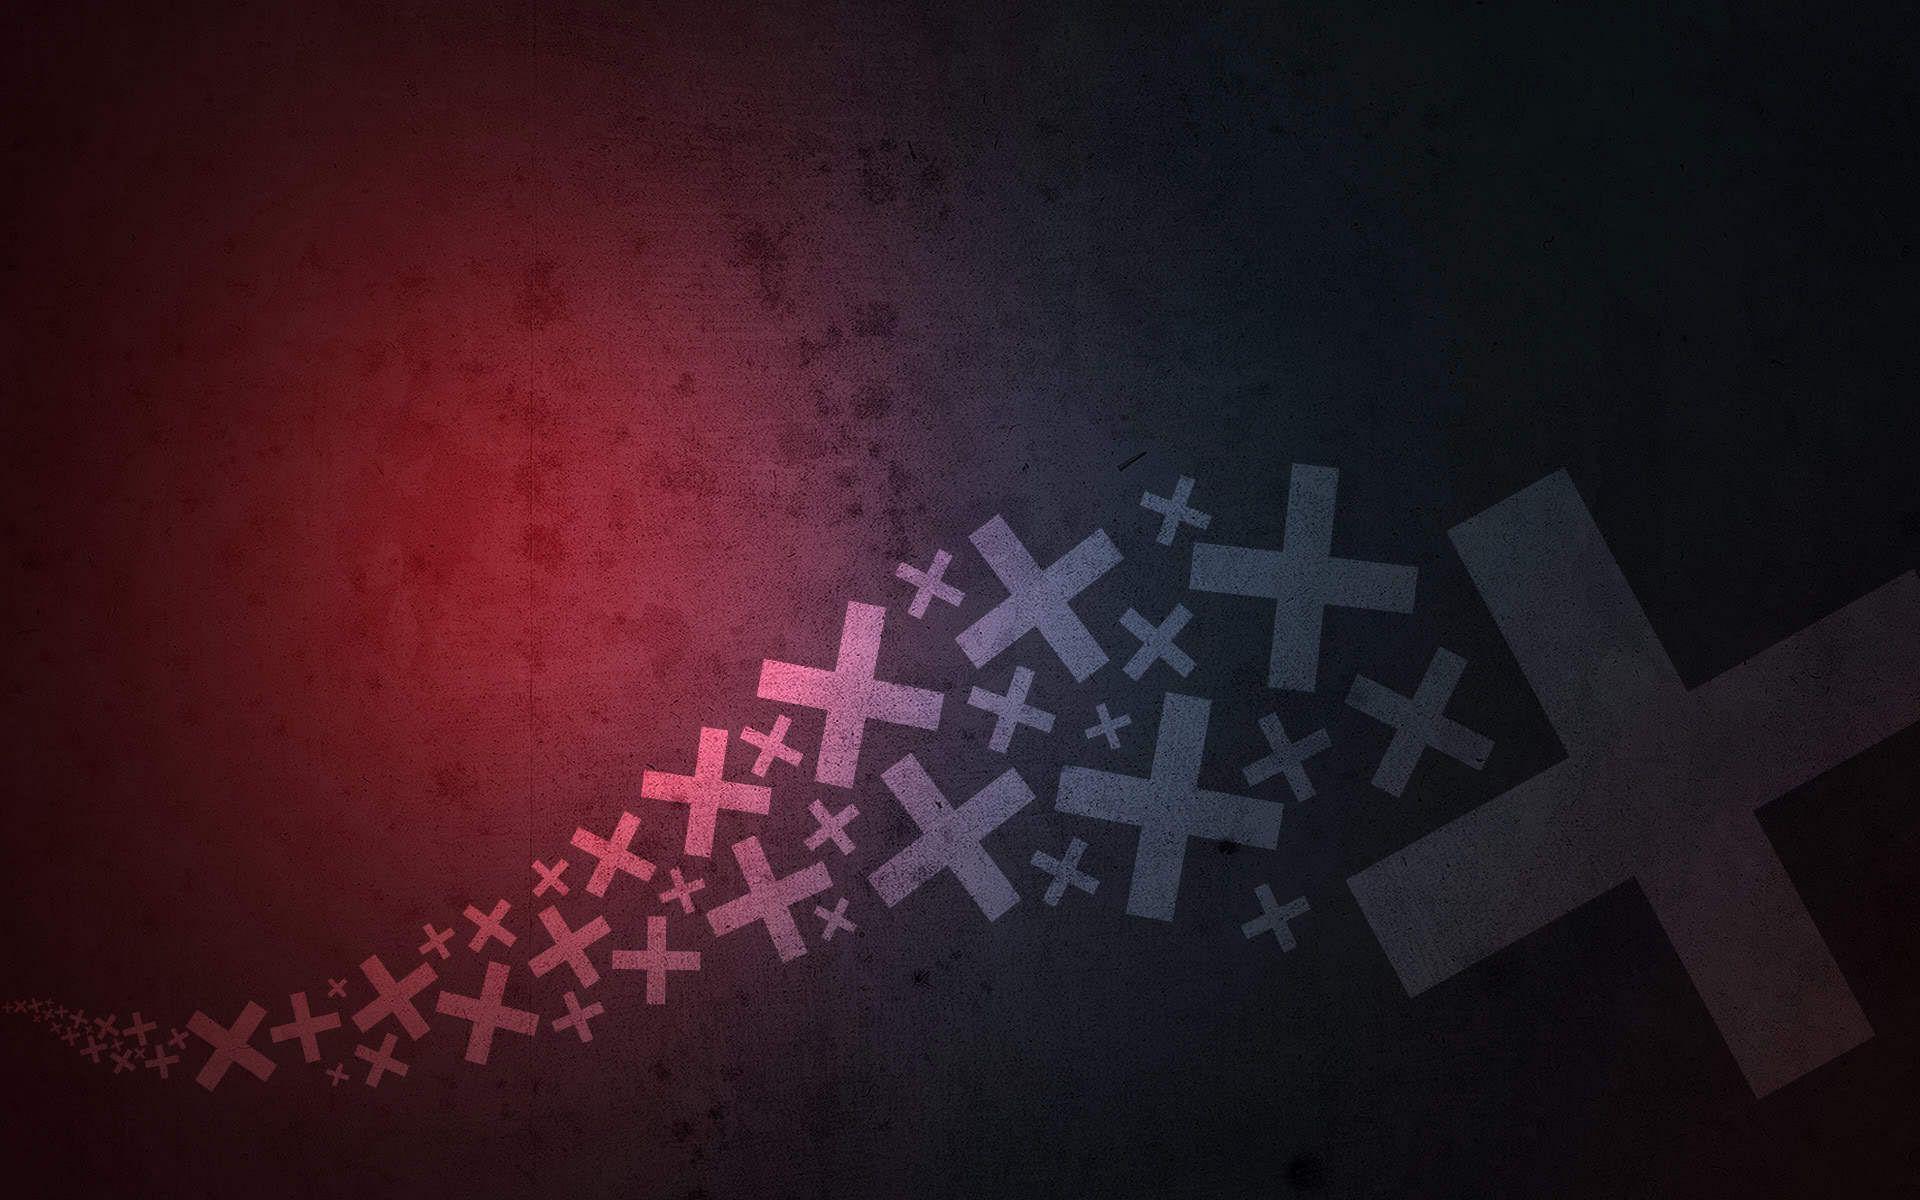 Jesus Christ Wallpaper Hd Cross Backgrounds Pixelstalk Net